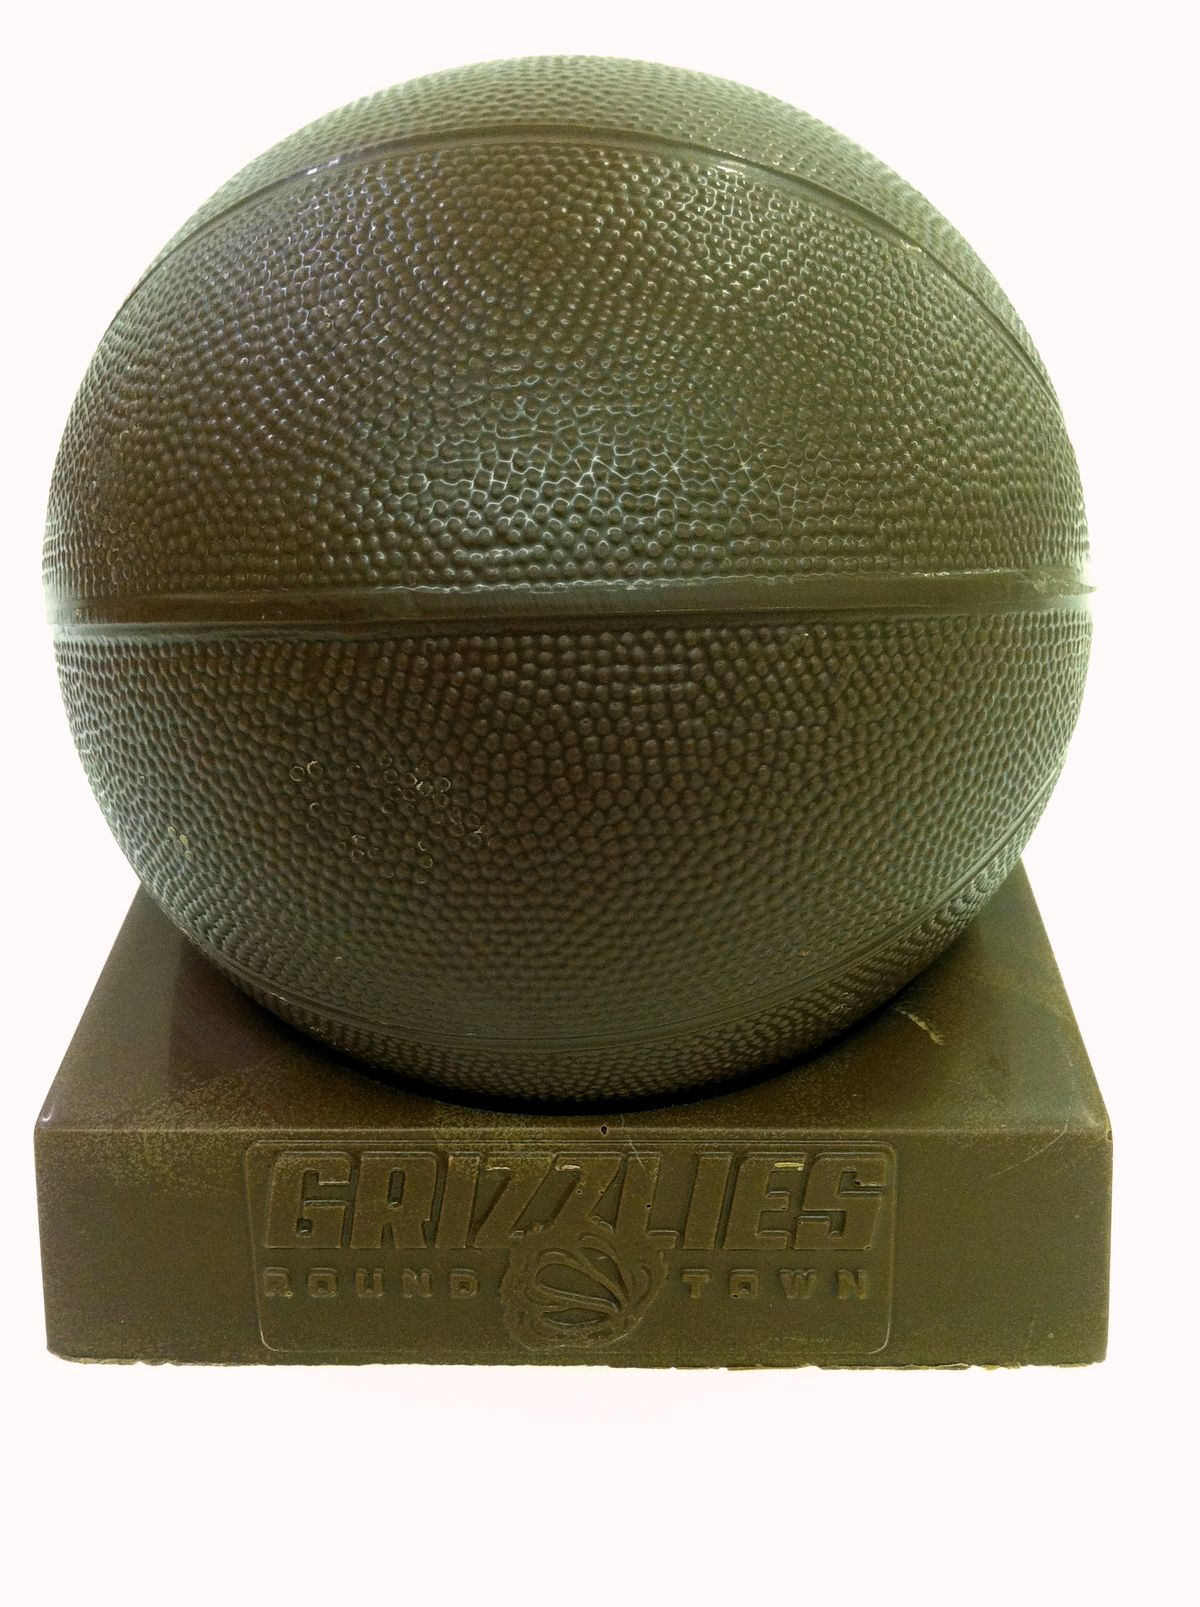 Grizzlies Basketball 001.jpg